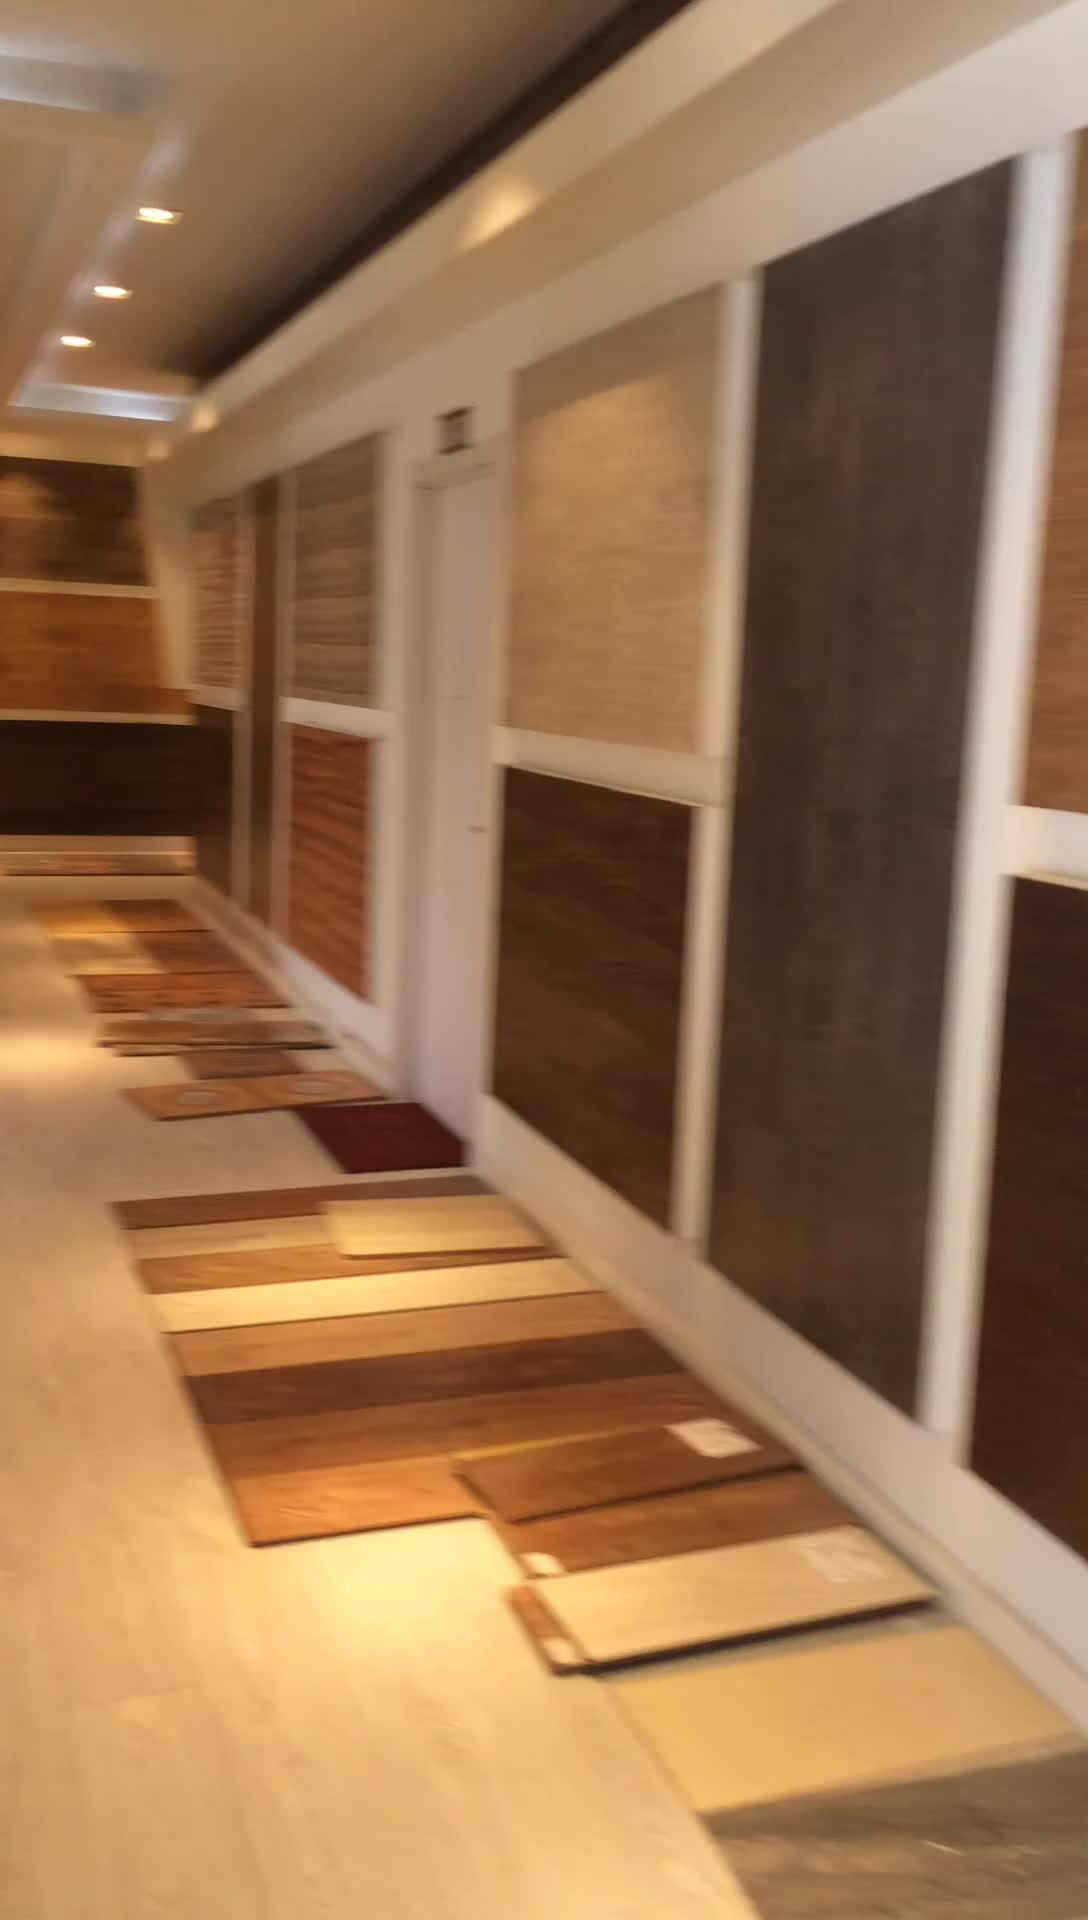 Rigid Core Pvc Sheet Flooring Spc Vinyl Tile Lvt Spc